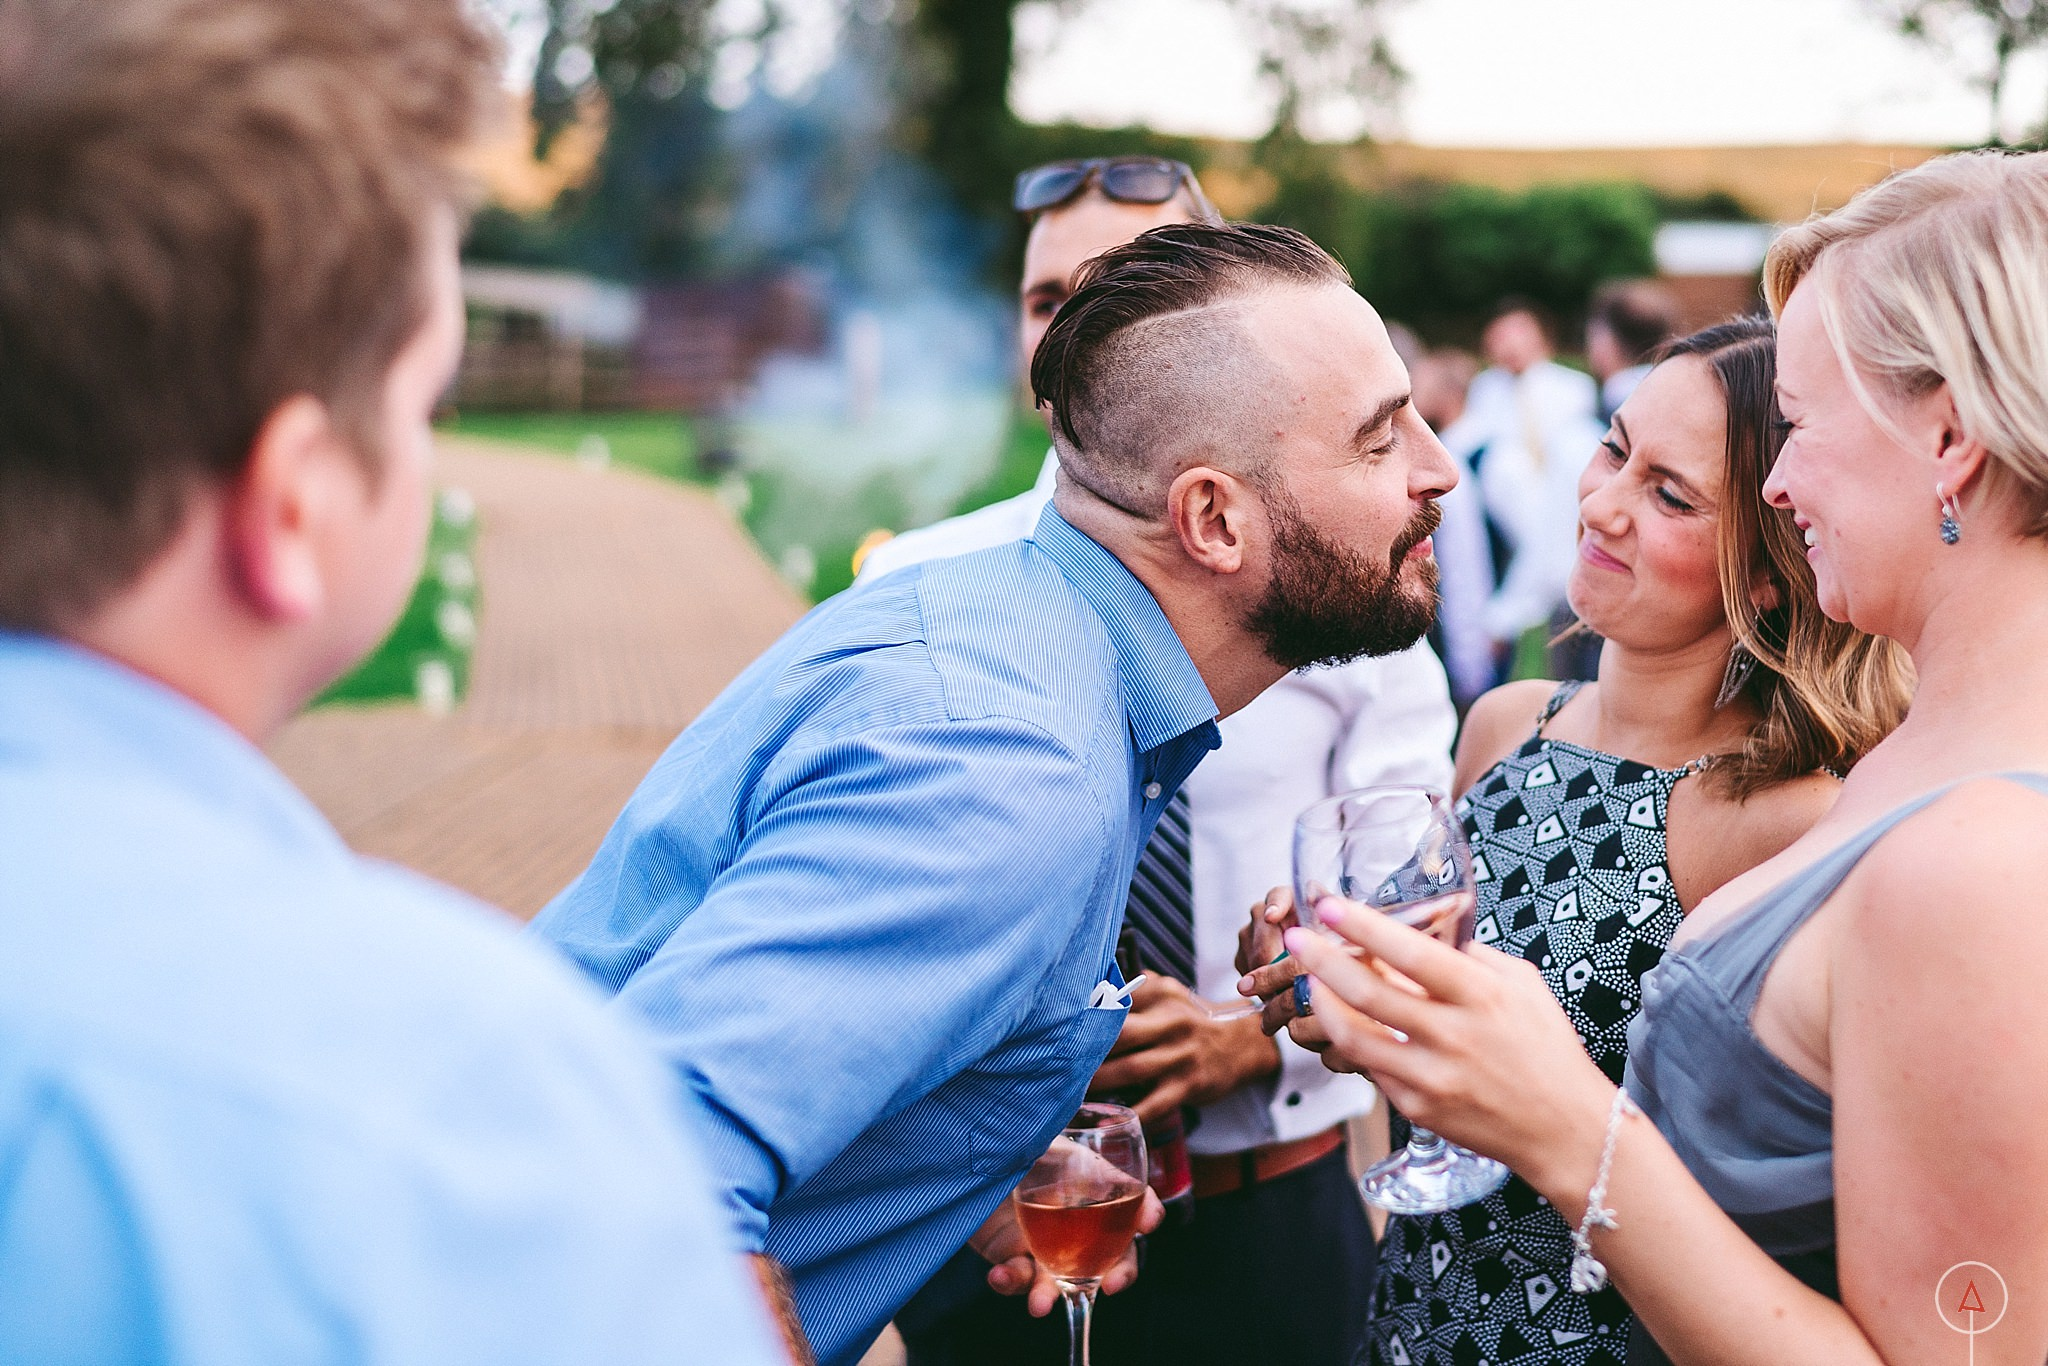 cardiff-wedding-photographer-aga-tomaszek_0393